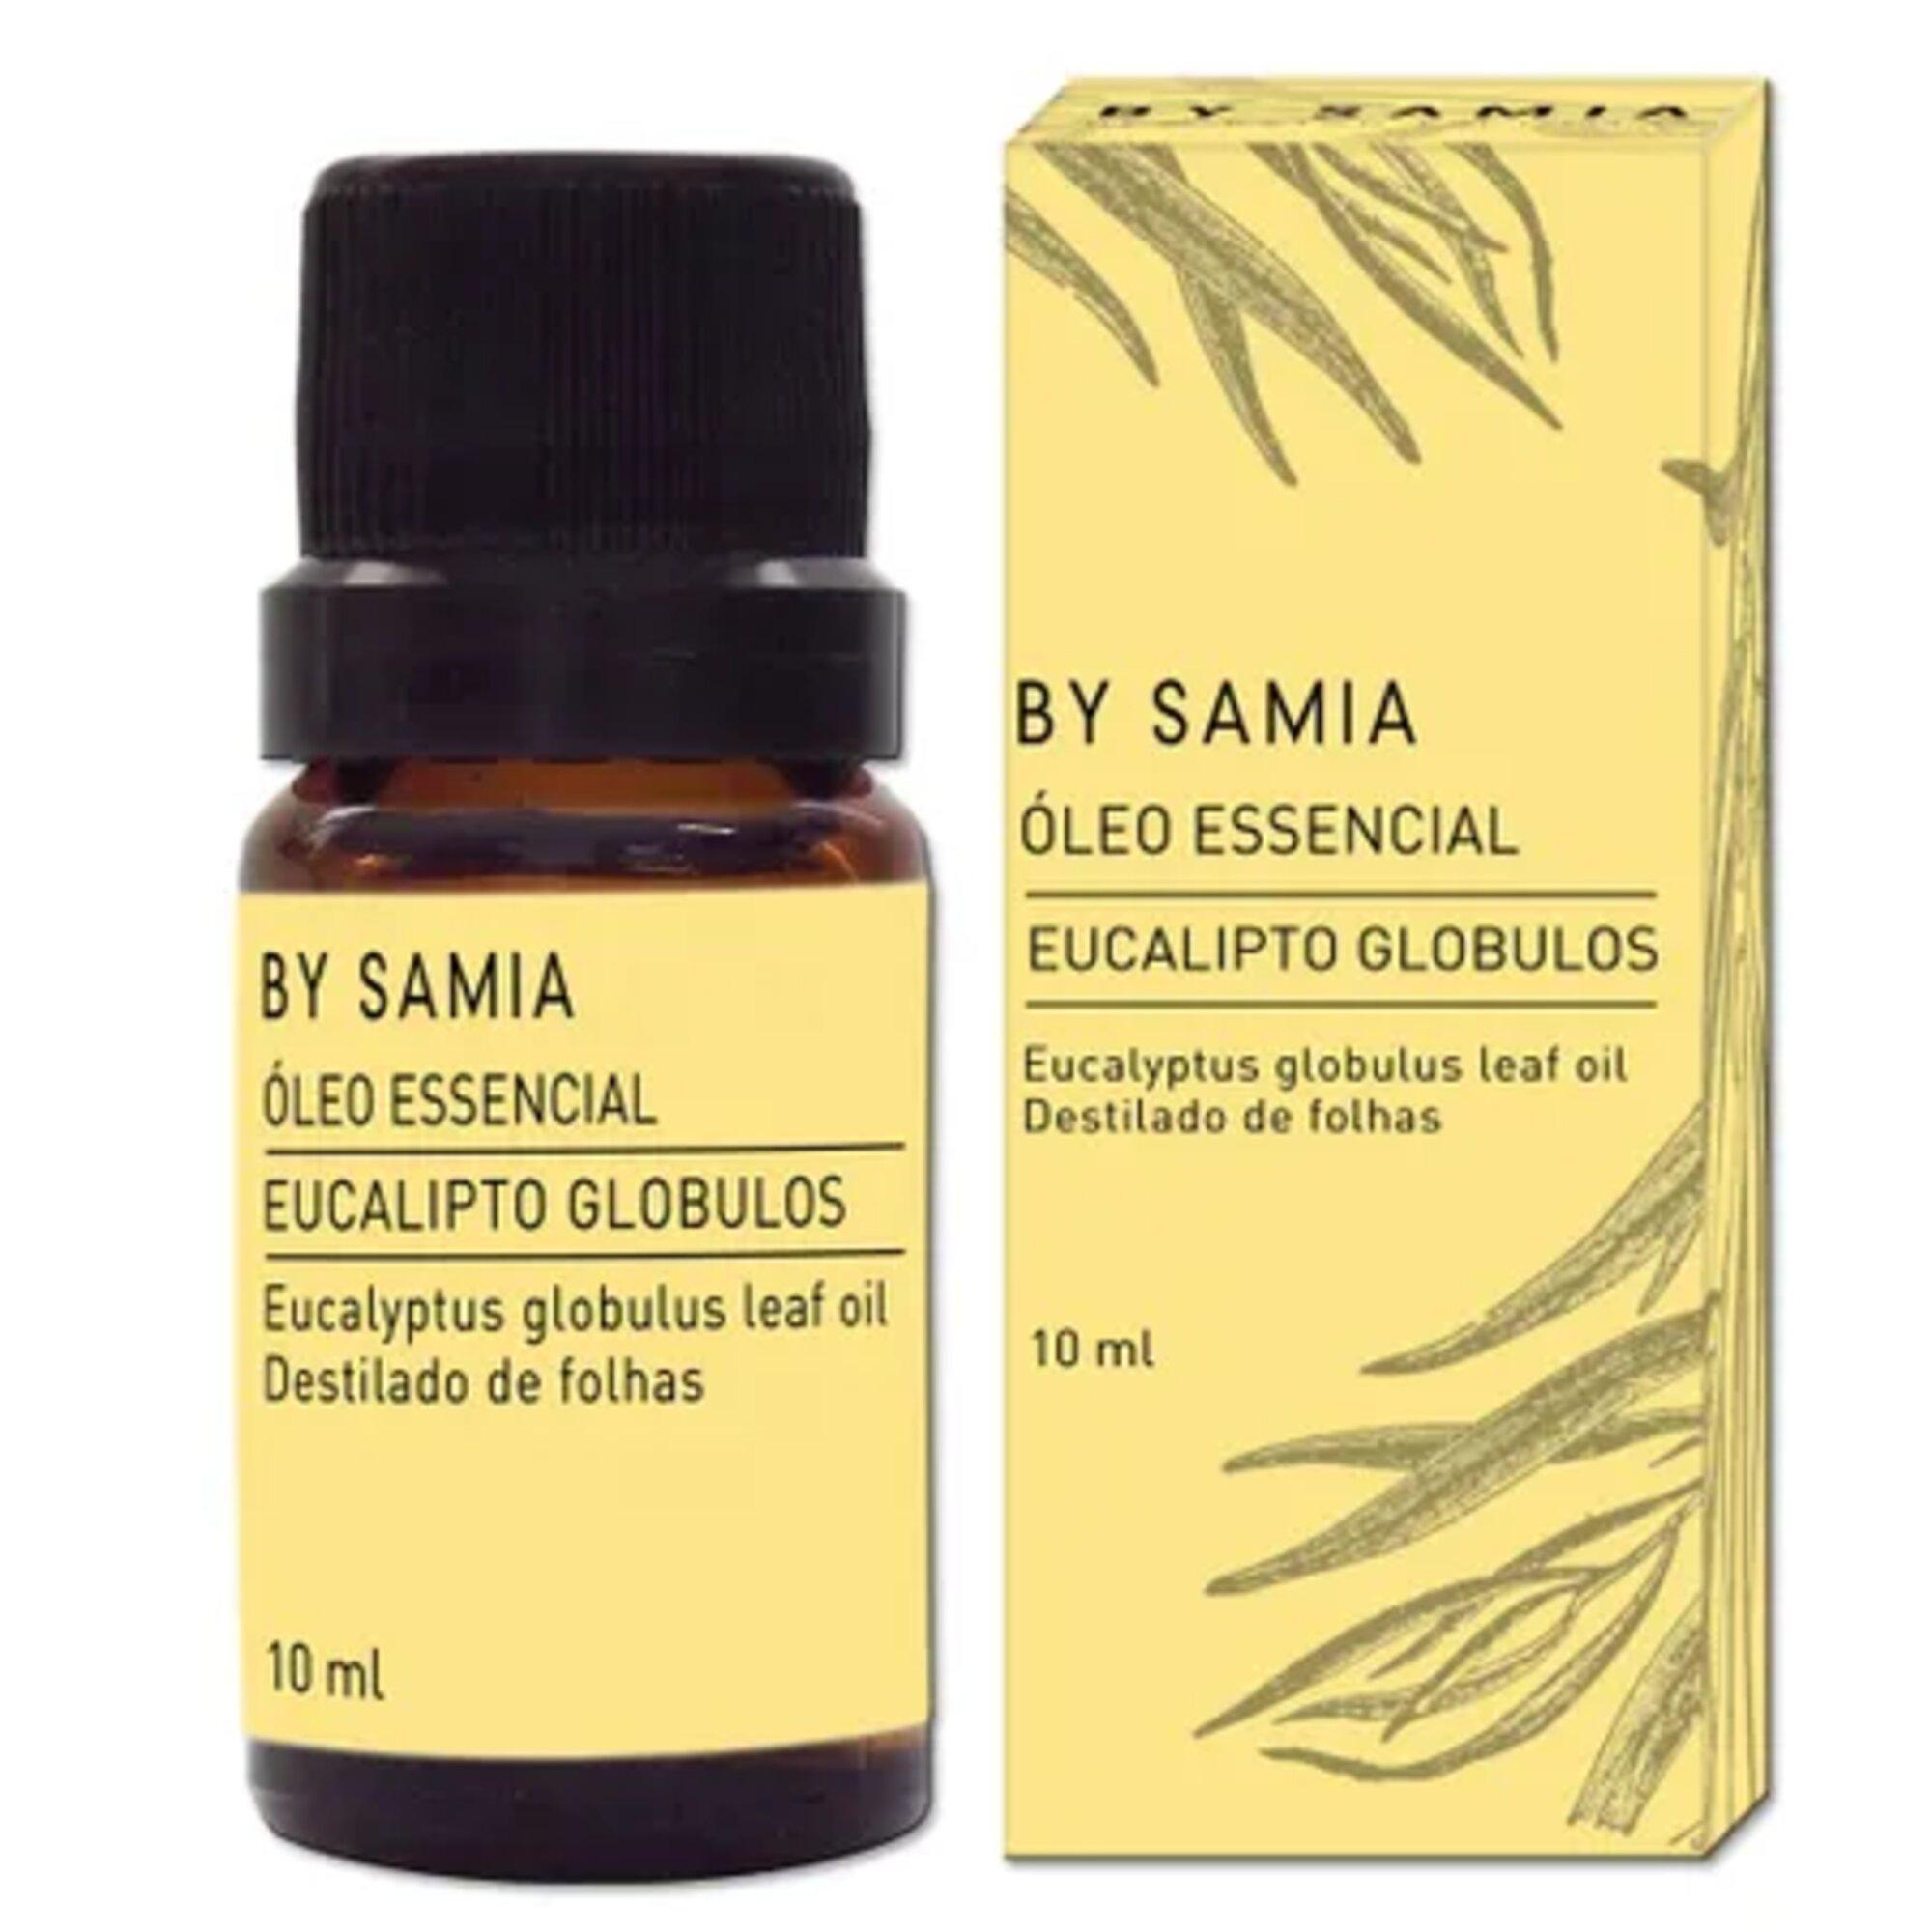 Óleo Essencial Eucalipto Globulos 10mL By Samia